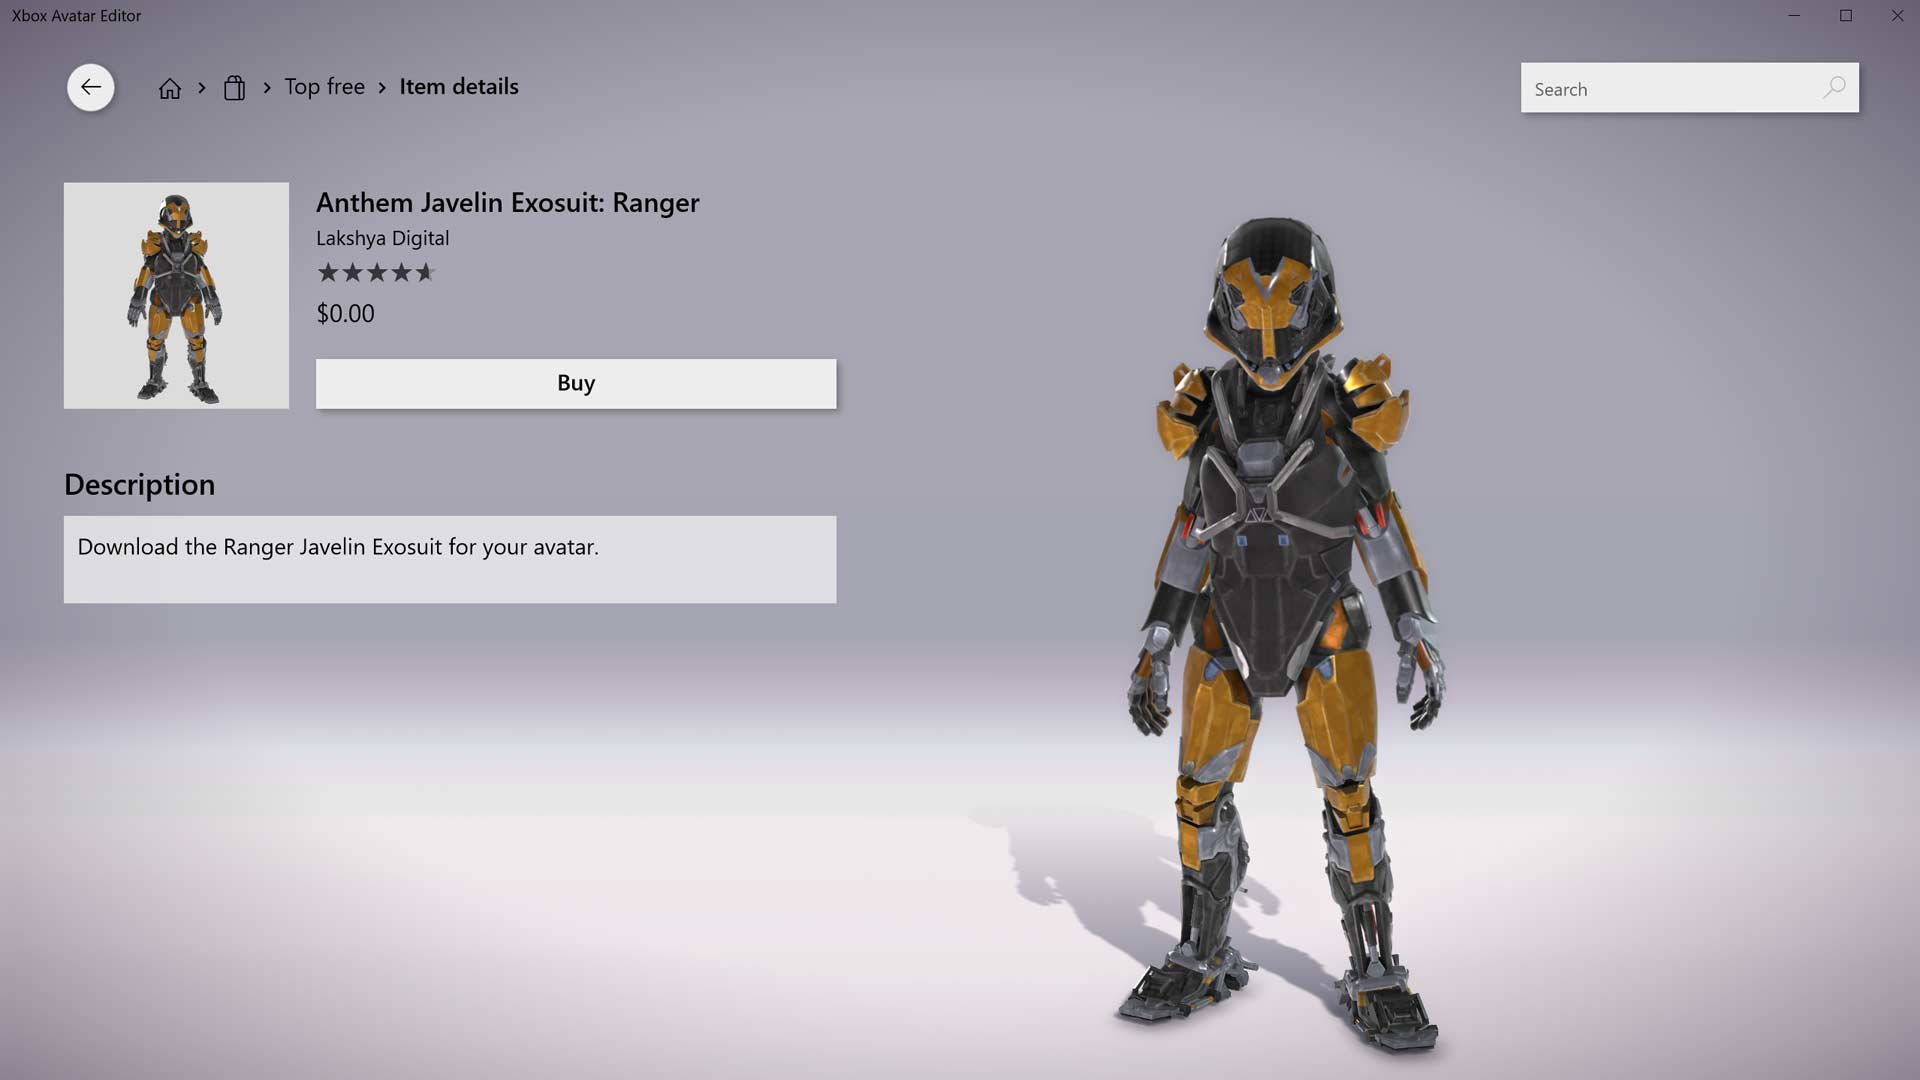 Anthem Javelin Exosuit Ranger Gamerheadquarters